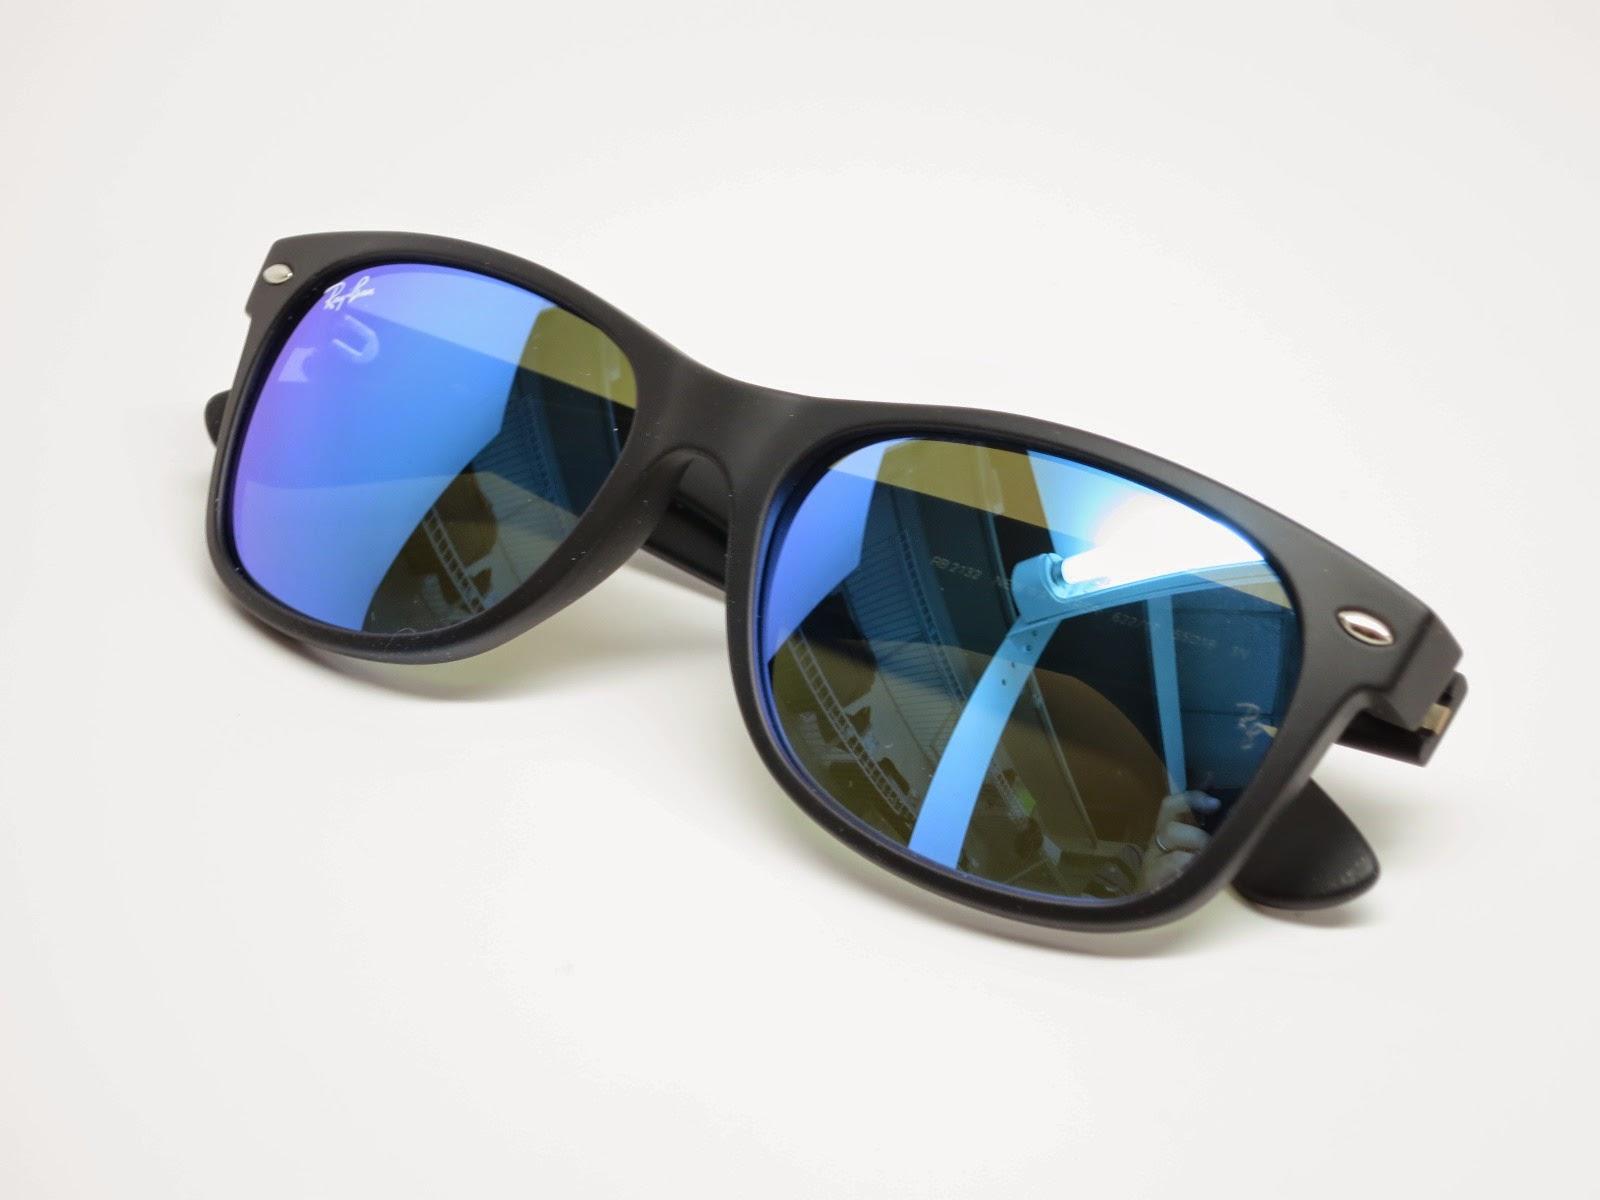 ray ban glasses bent  ray ban rb 2132 new wayfarer 622/17 blue mirrored sunglasses